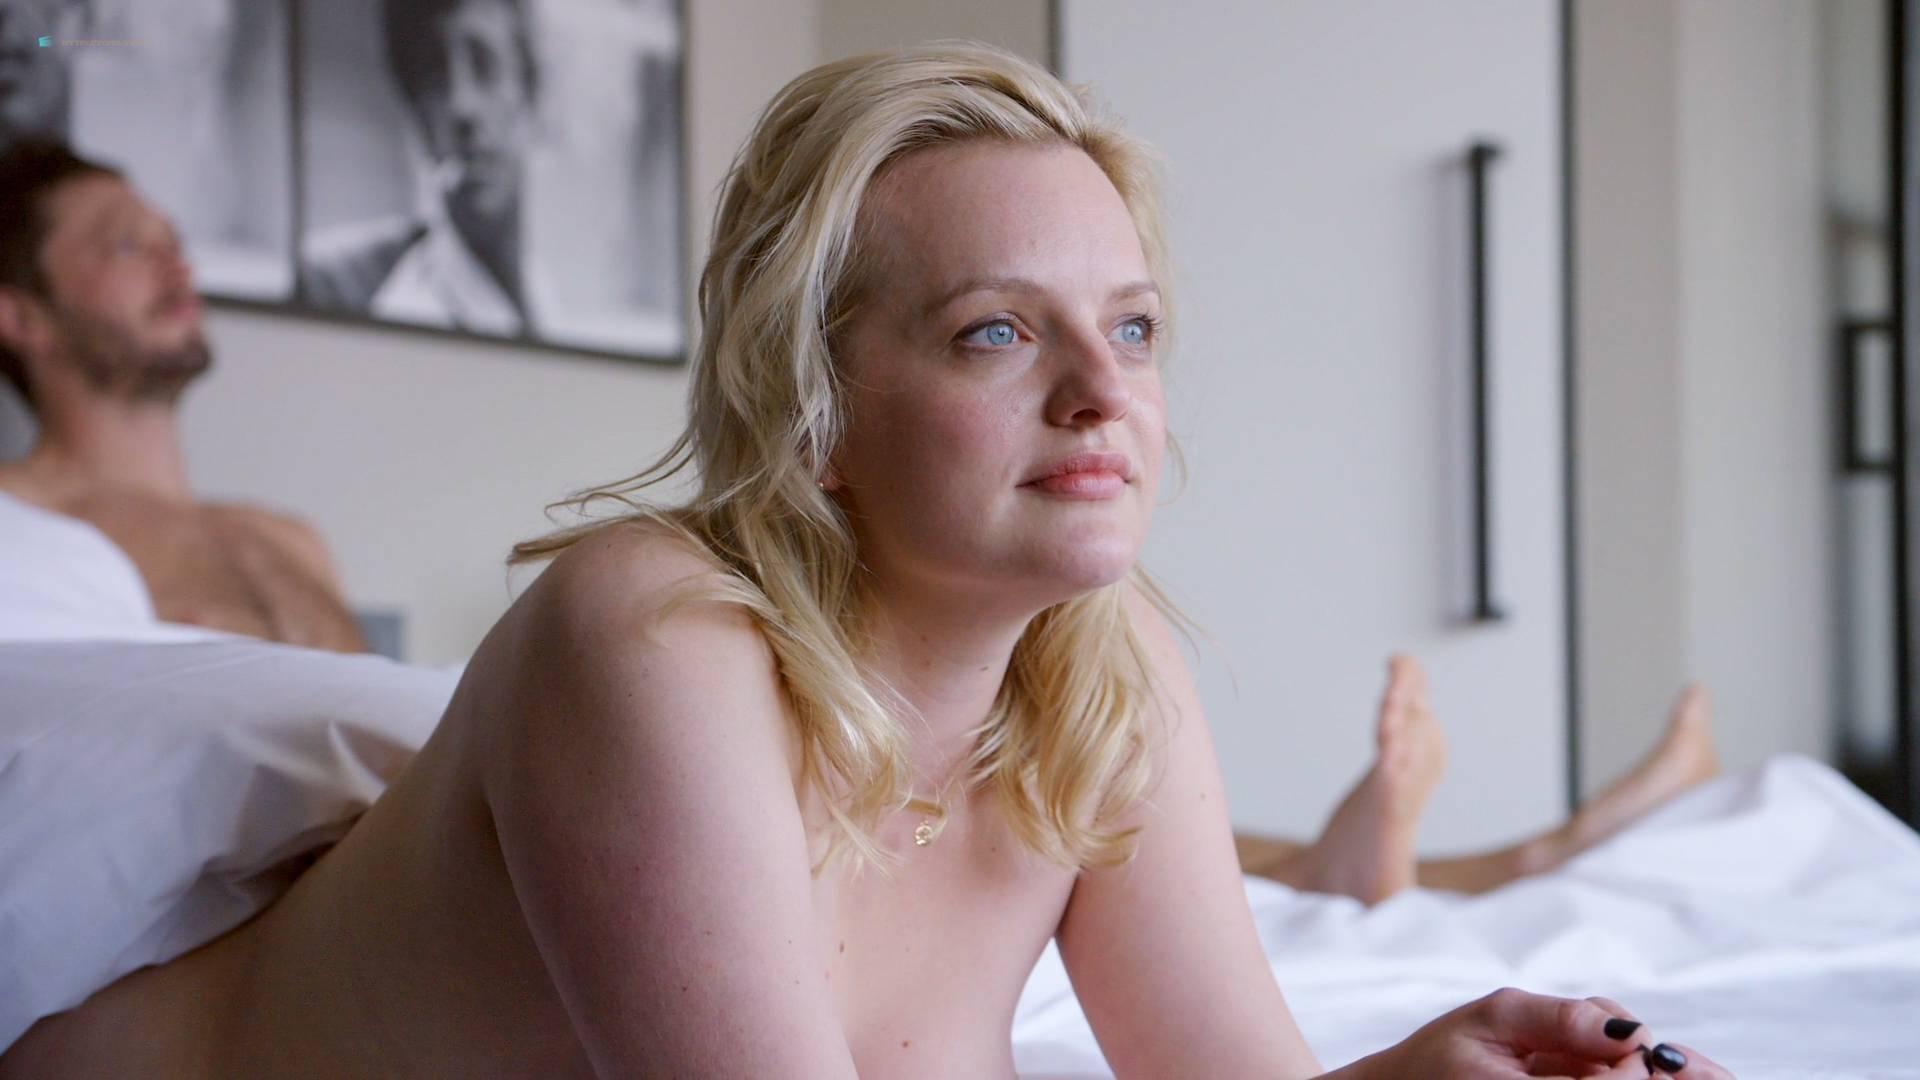 Elisabeth Moss Hot Some Mild Sex - Tokyo Project 2017 Hd -7855